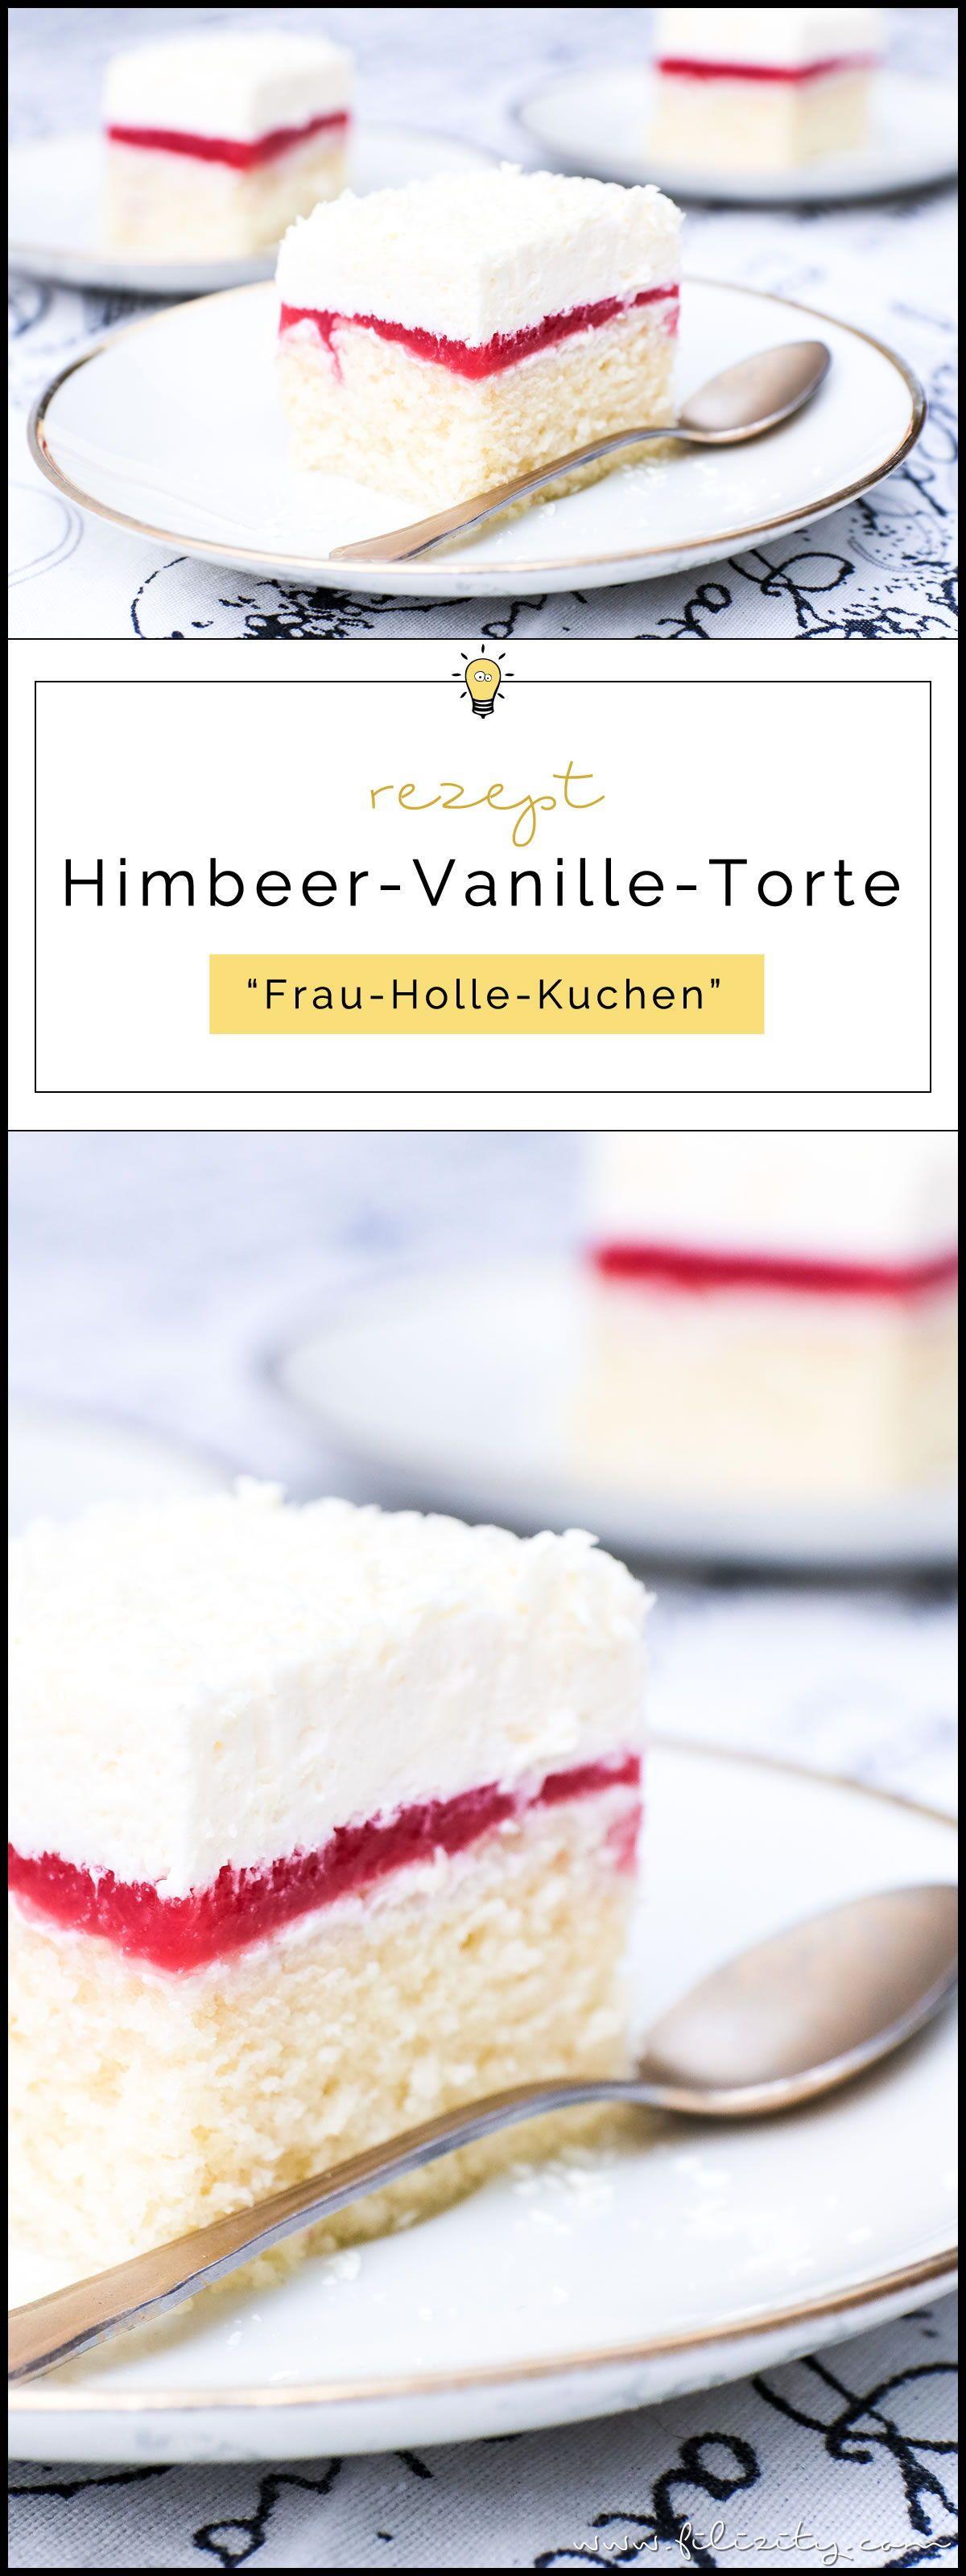 Photo of Raspberry and vanilla cake (Frau Holle Kuchen) Filizity.com | F …